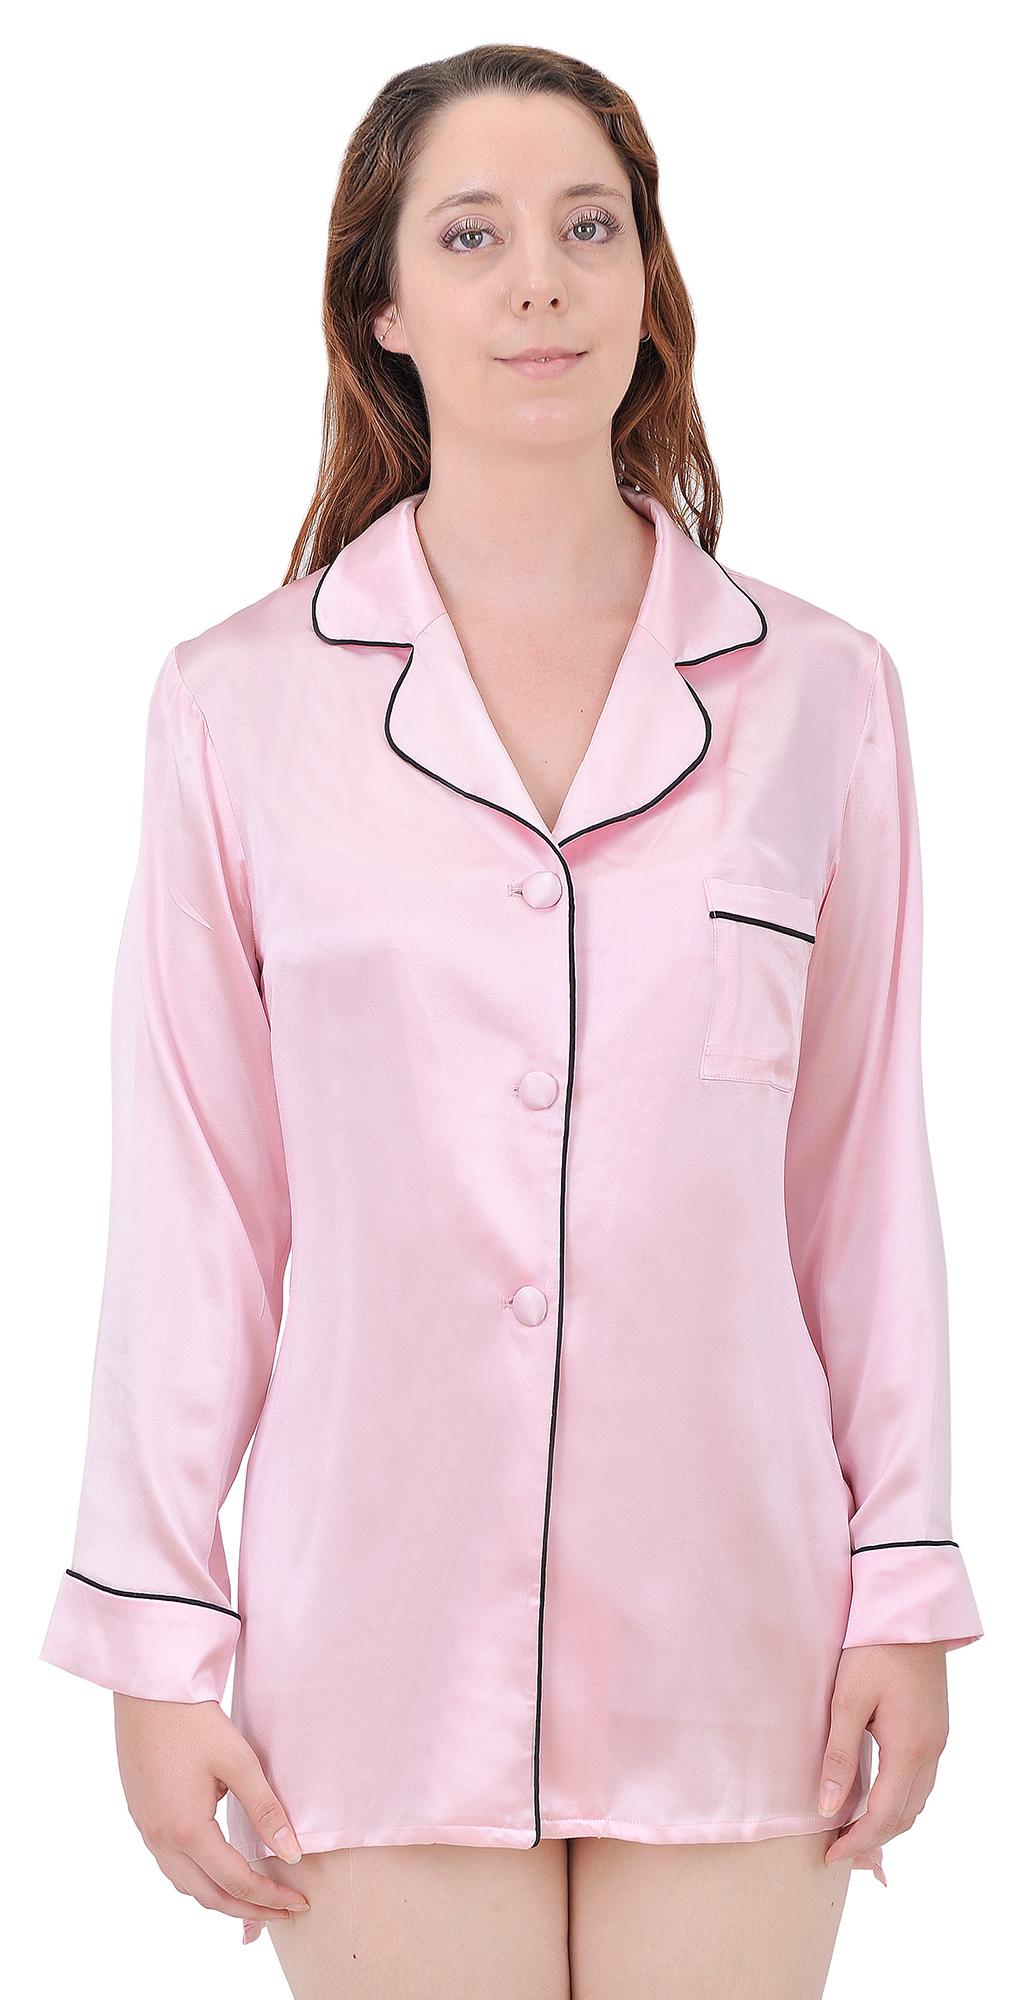 Marycrafts Silk Garvin Pyjama Pajama Blouse Shirt Top